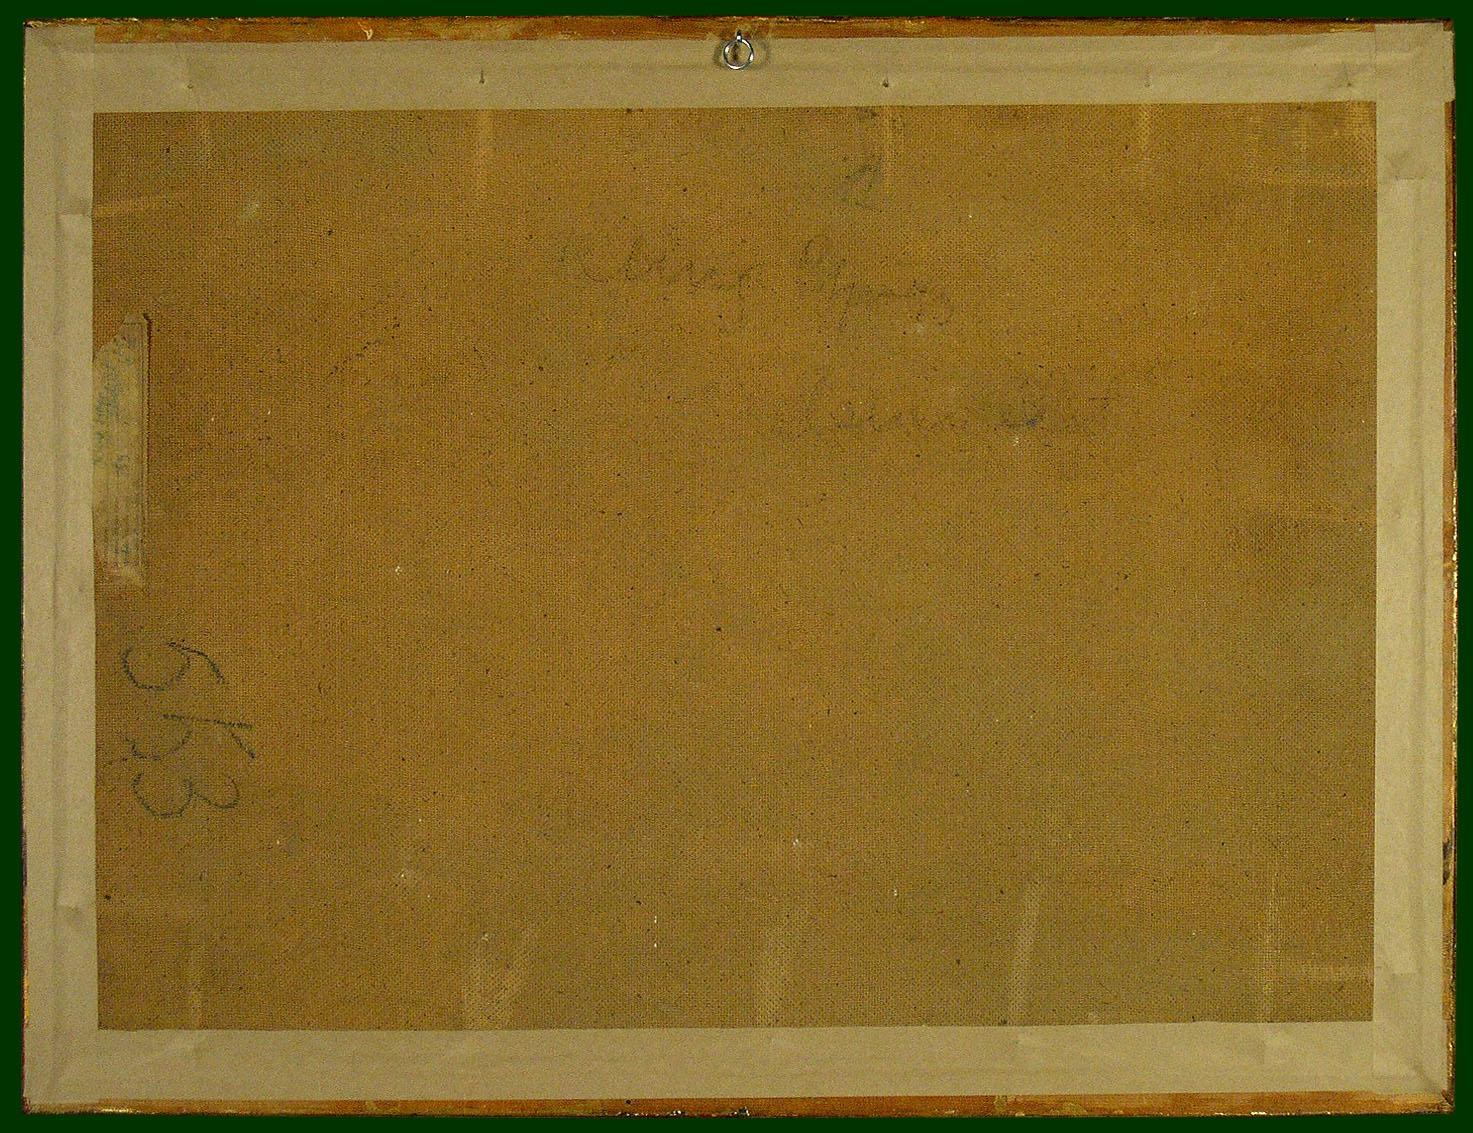 62-5hat.JPG (1473×1133)